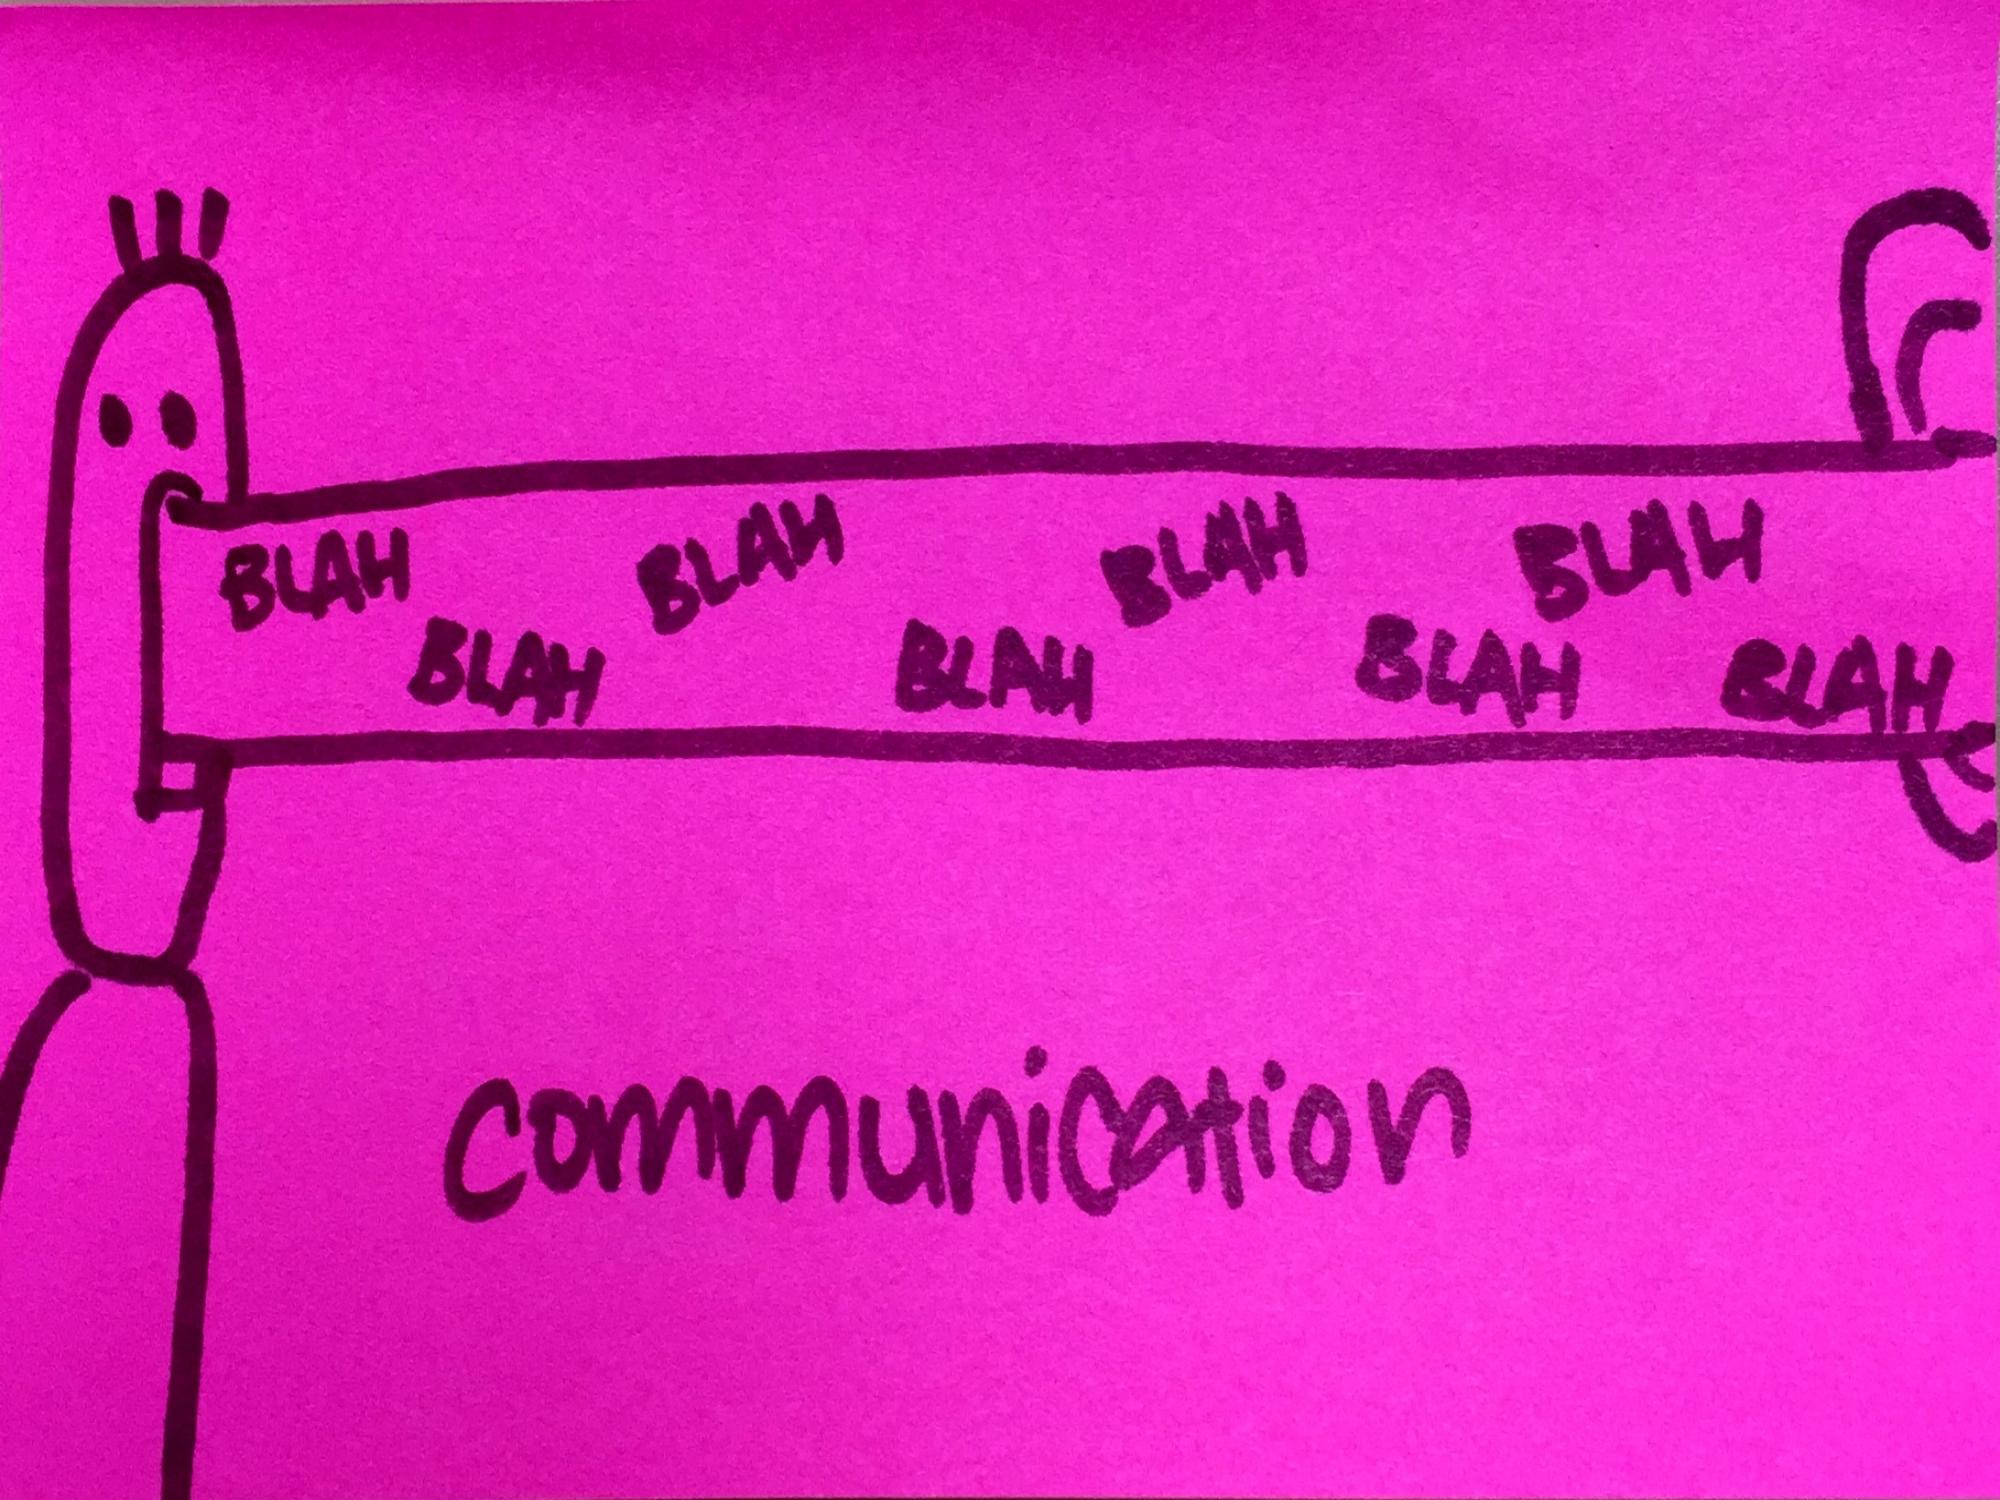 Communication StrengthsFinder Singapore Blabber Blah